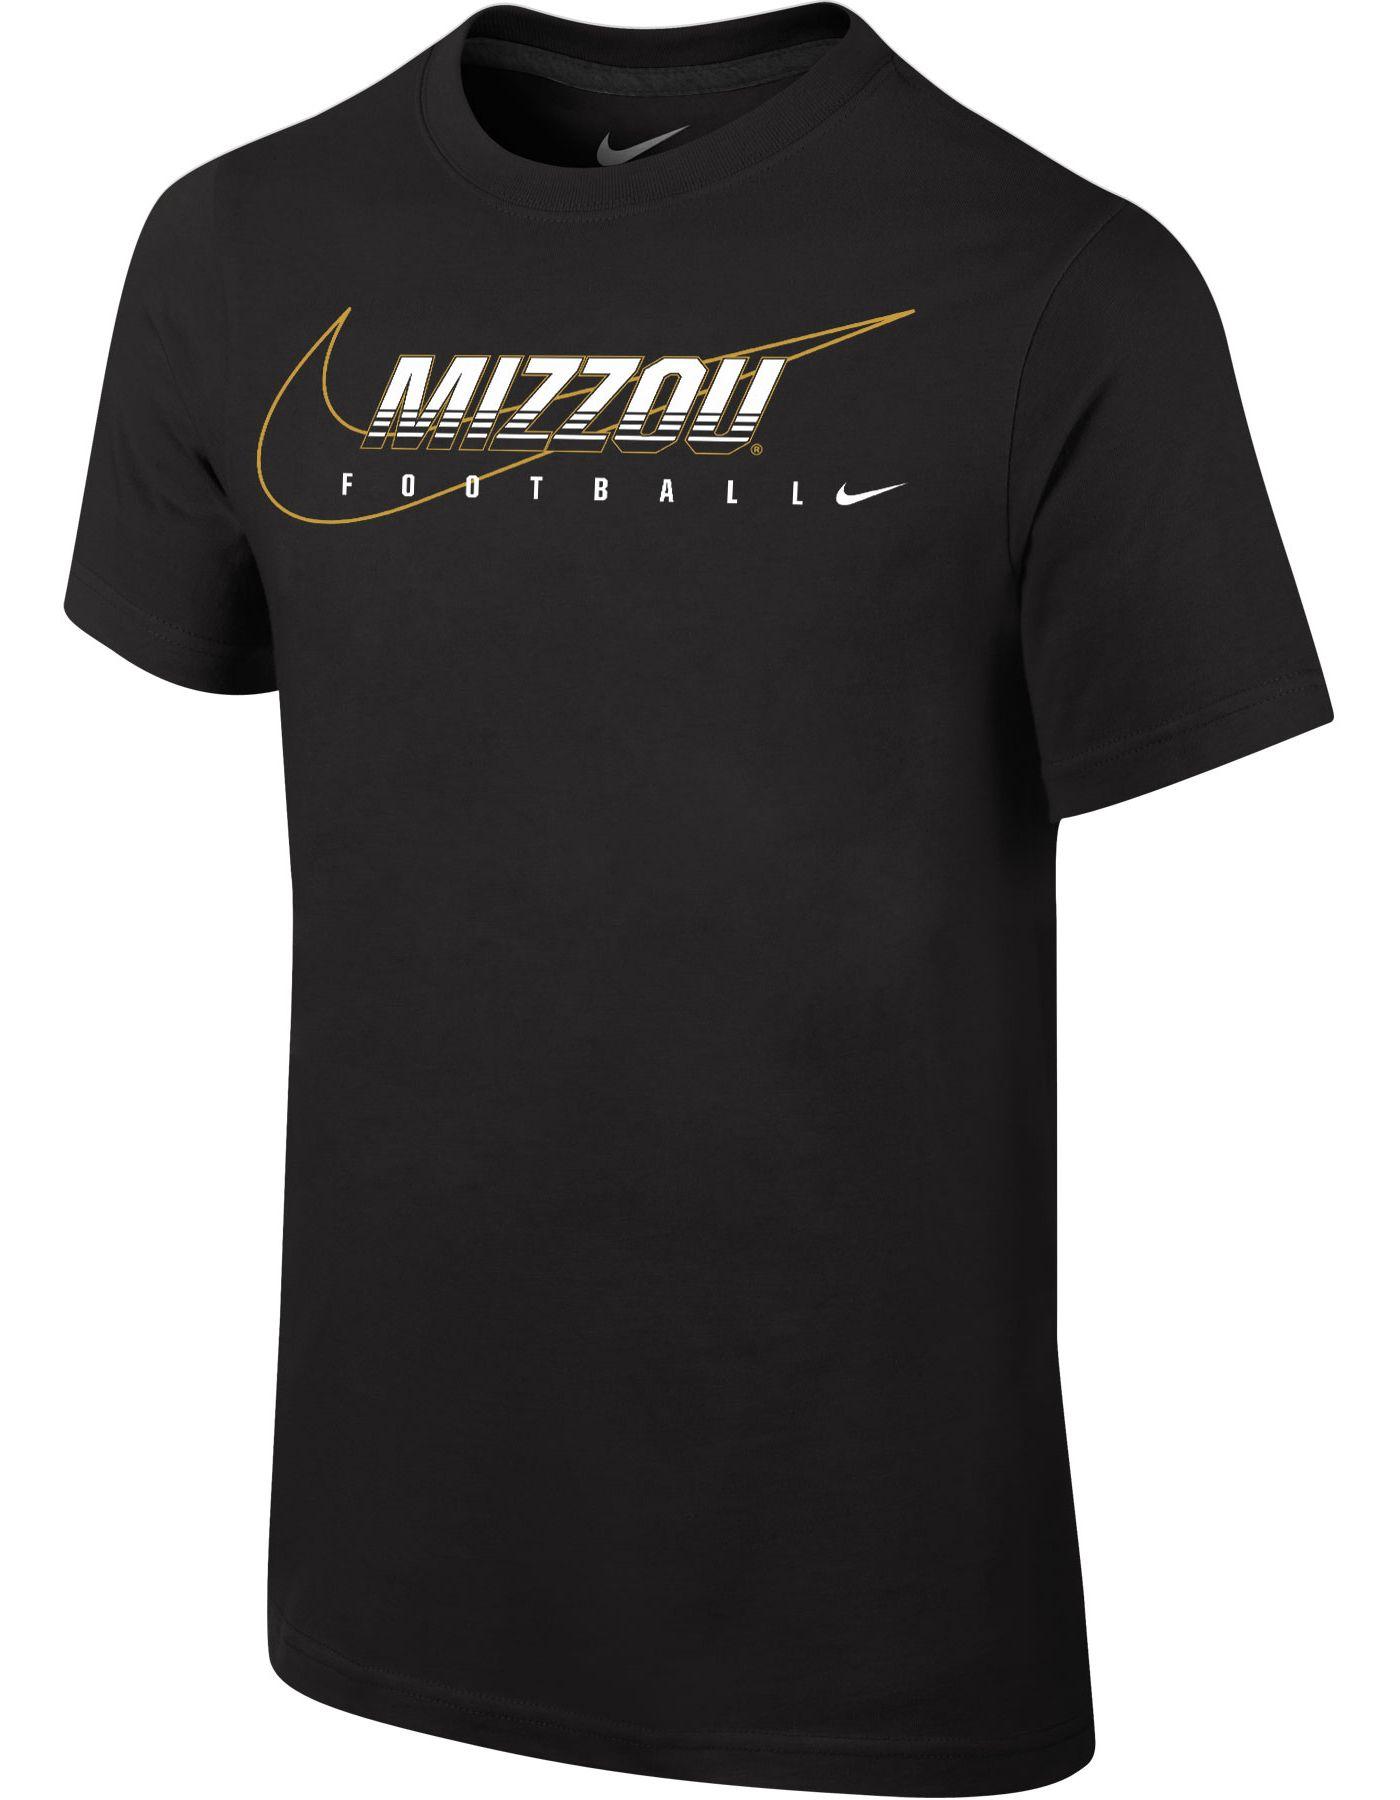 Nike Youth Missouri Tigers Football Dri-FIT Cotton Facility Black T-Shirt